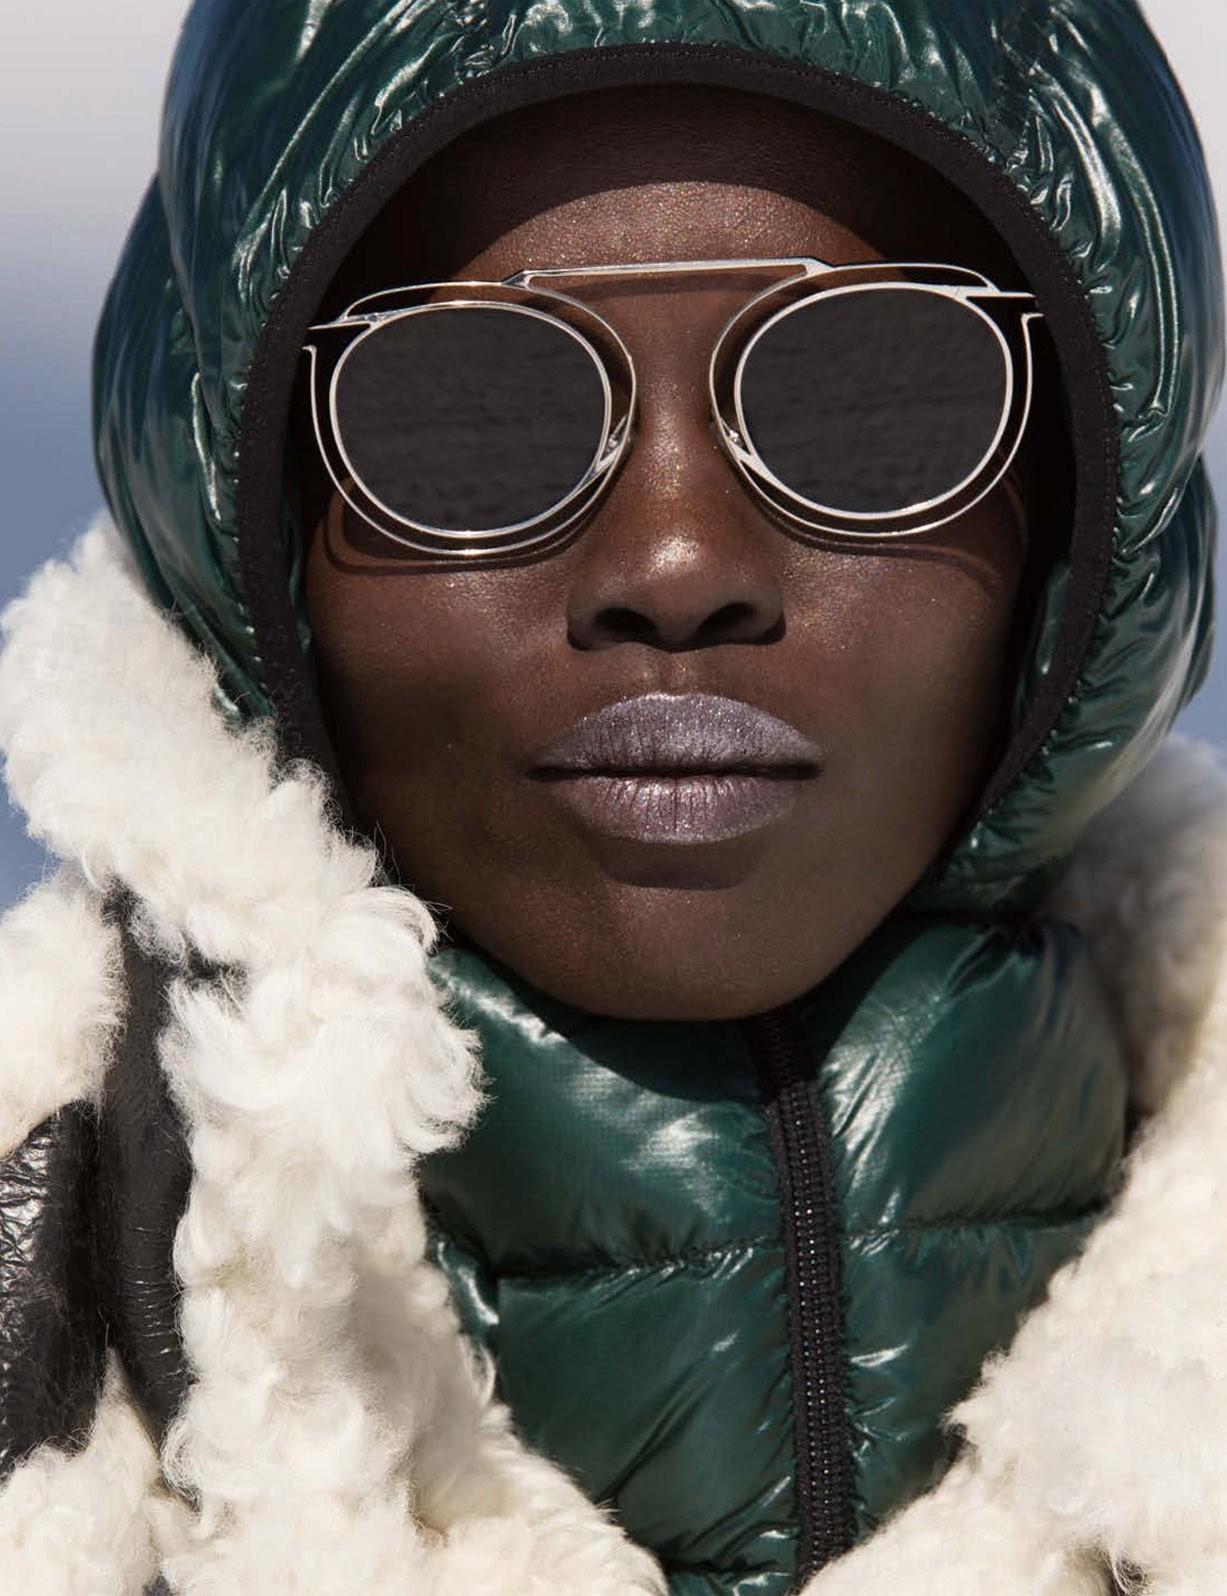 Grace Bol by Hans Feurer - Vogue Germany december 2017